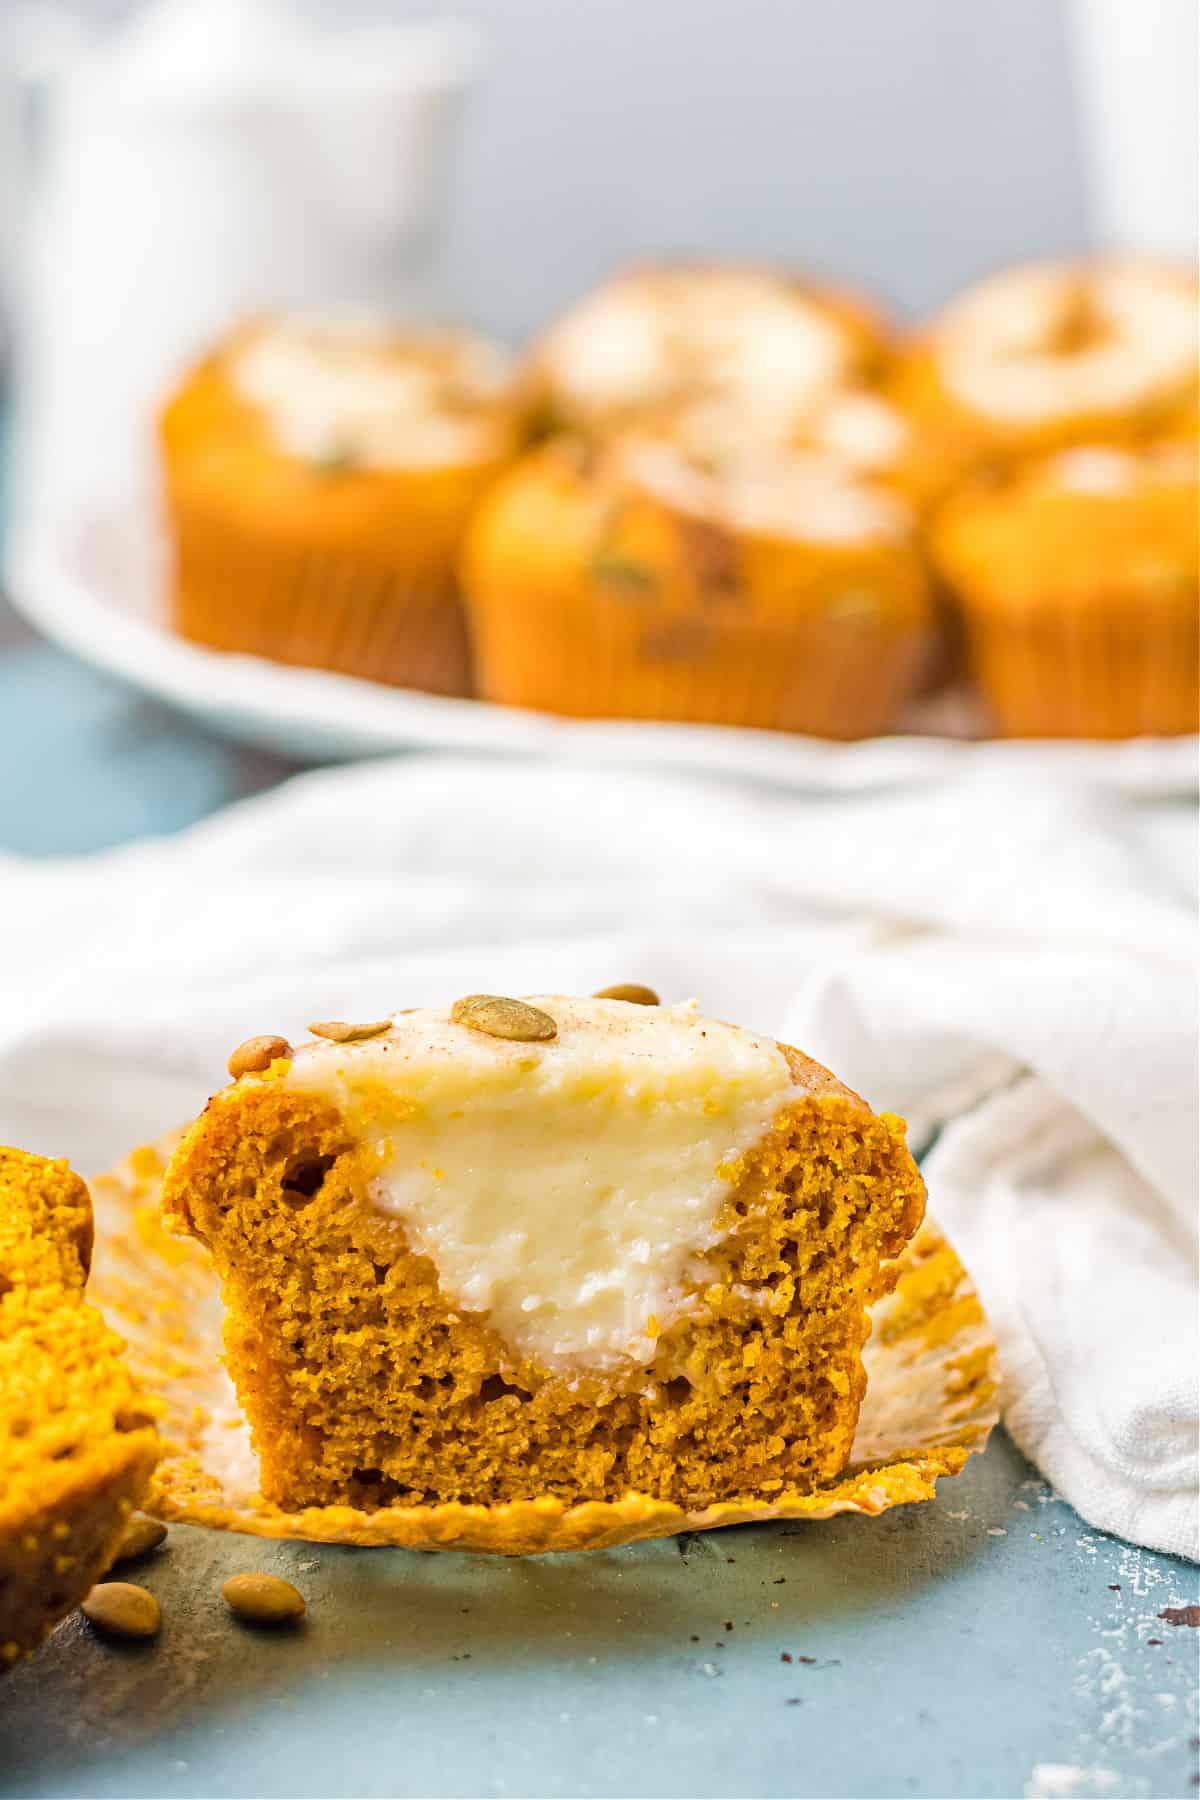 Pumpkin muffin with cream cheese filling cut in half.